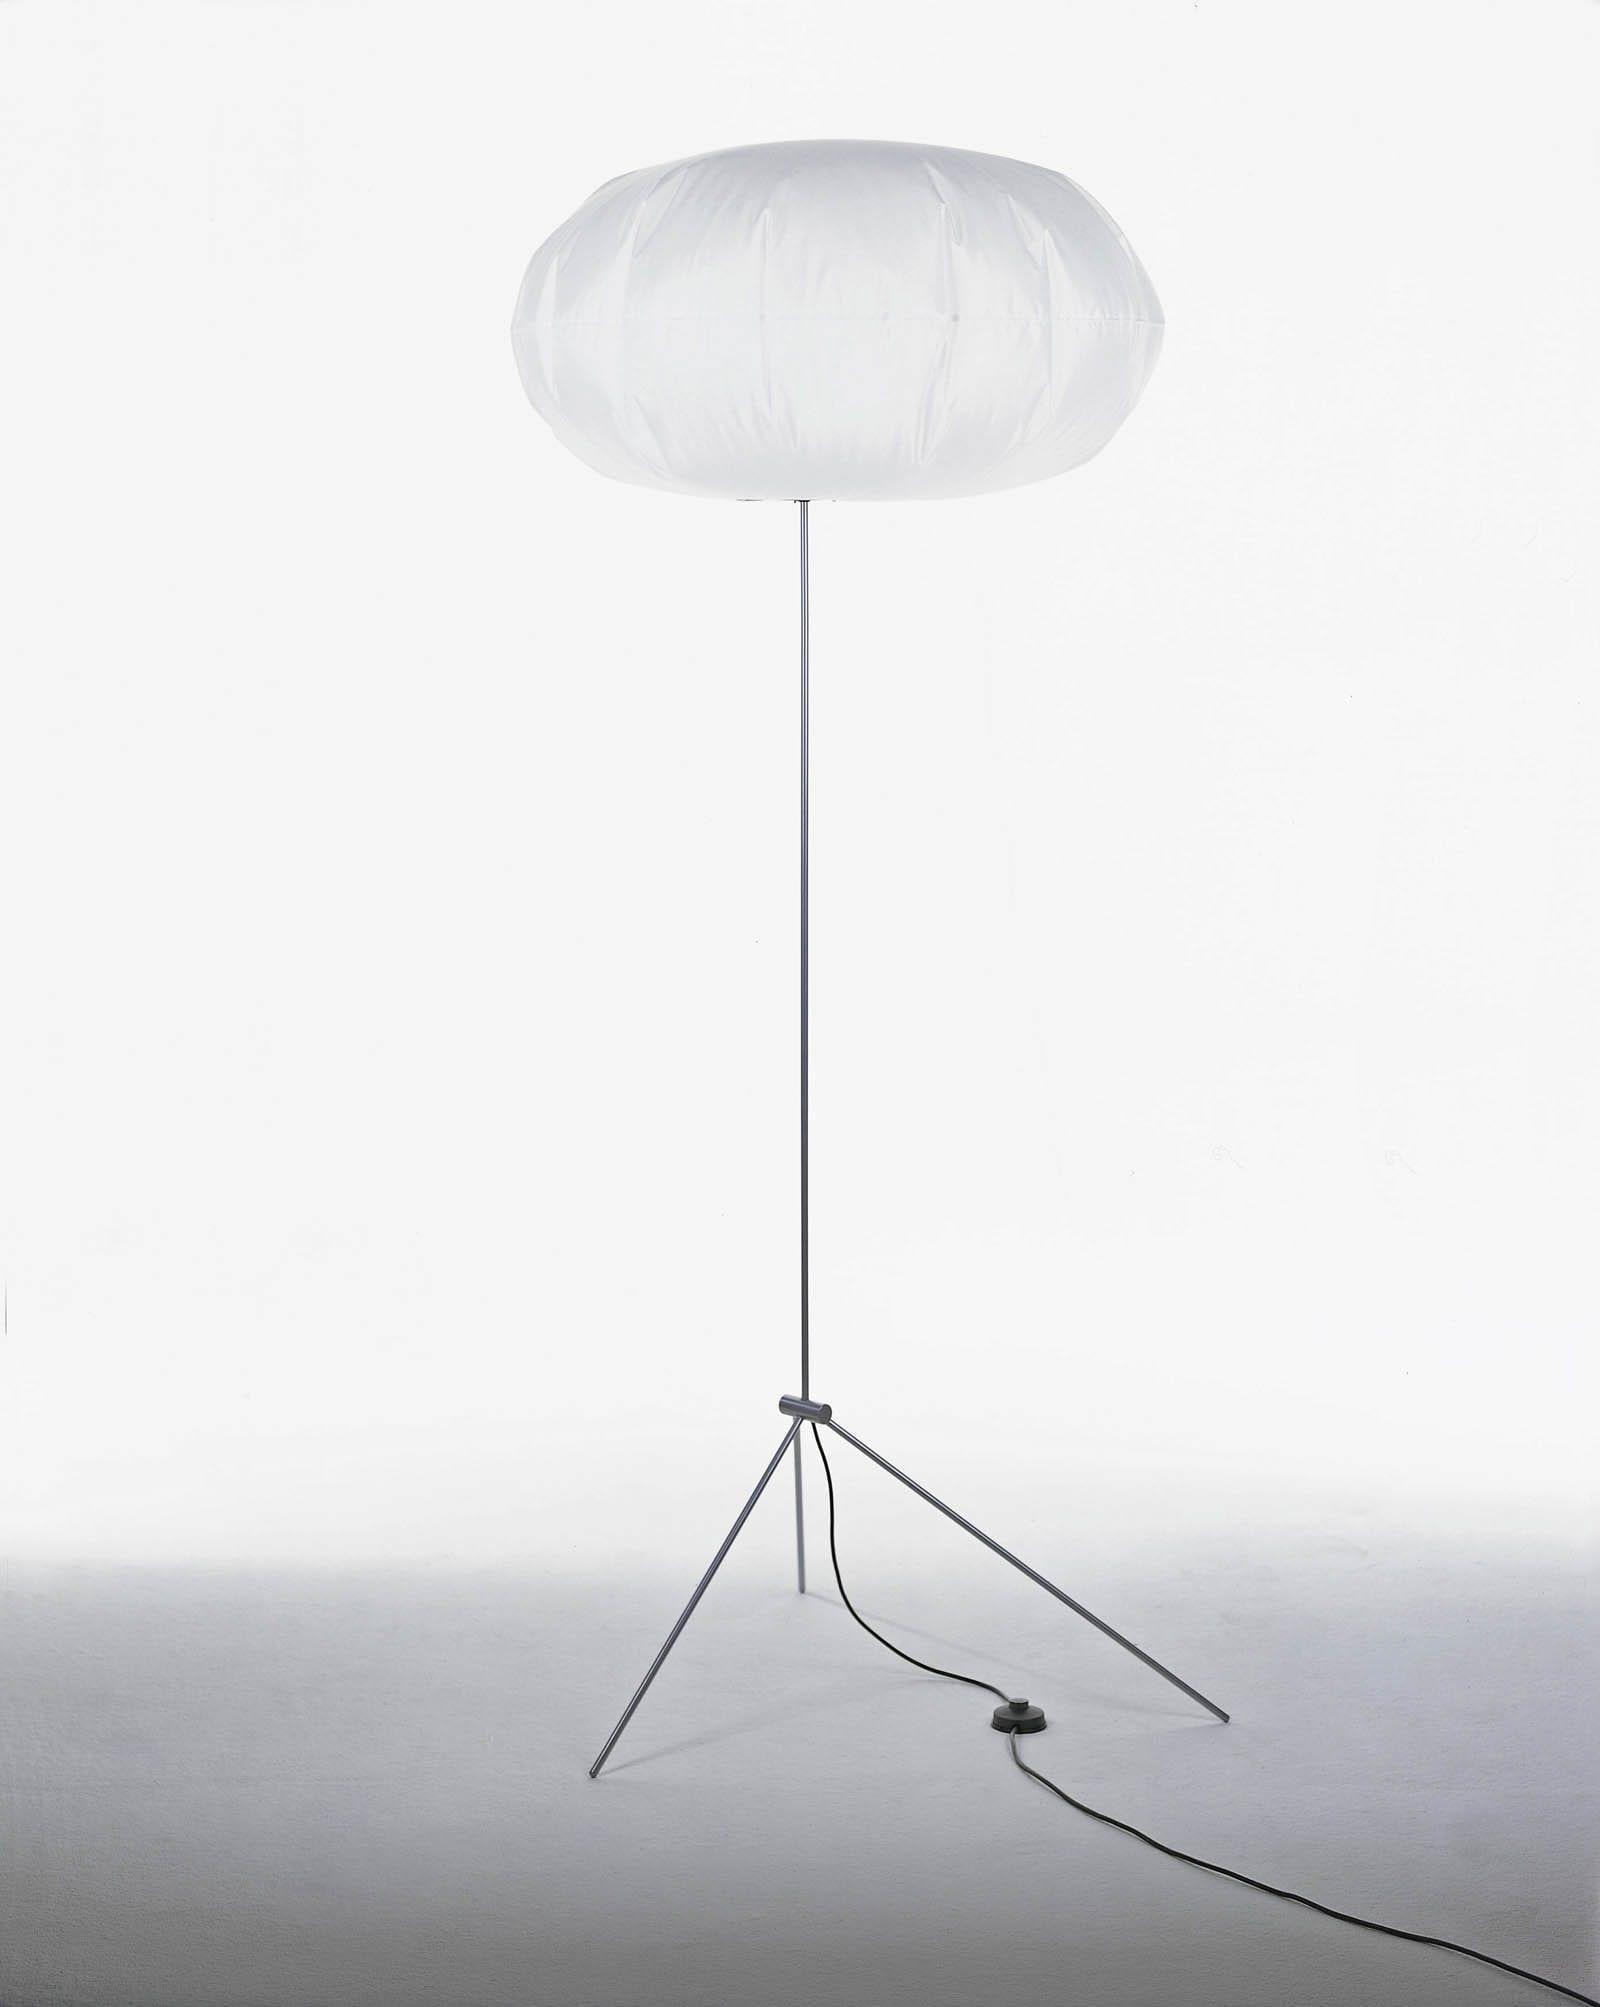 Globlow Light Collection Valvomo Architects Ltd